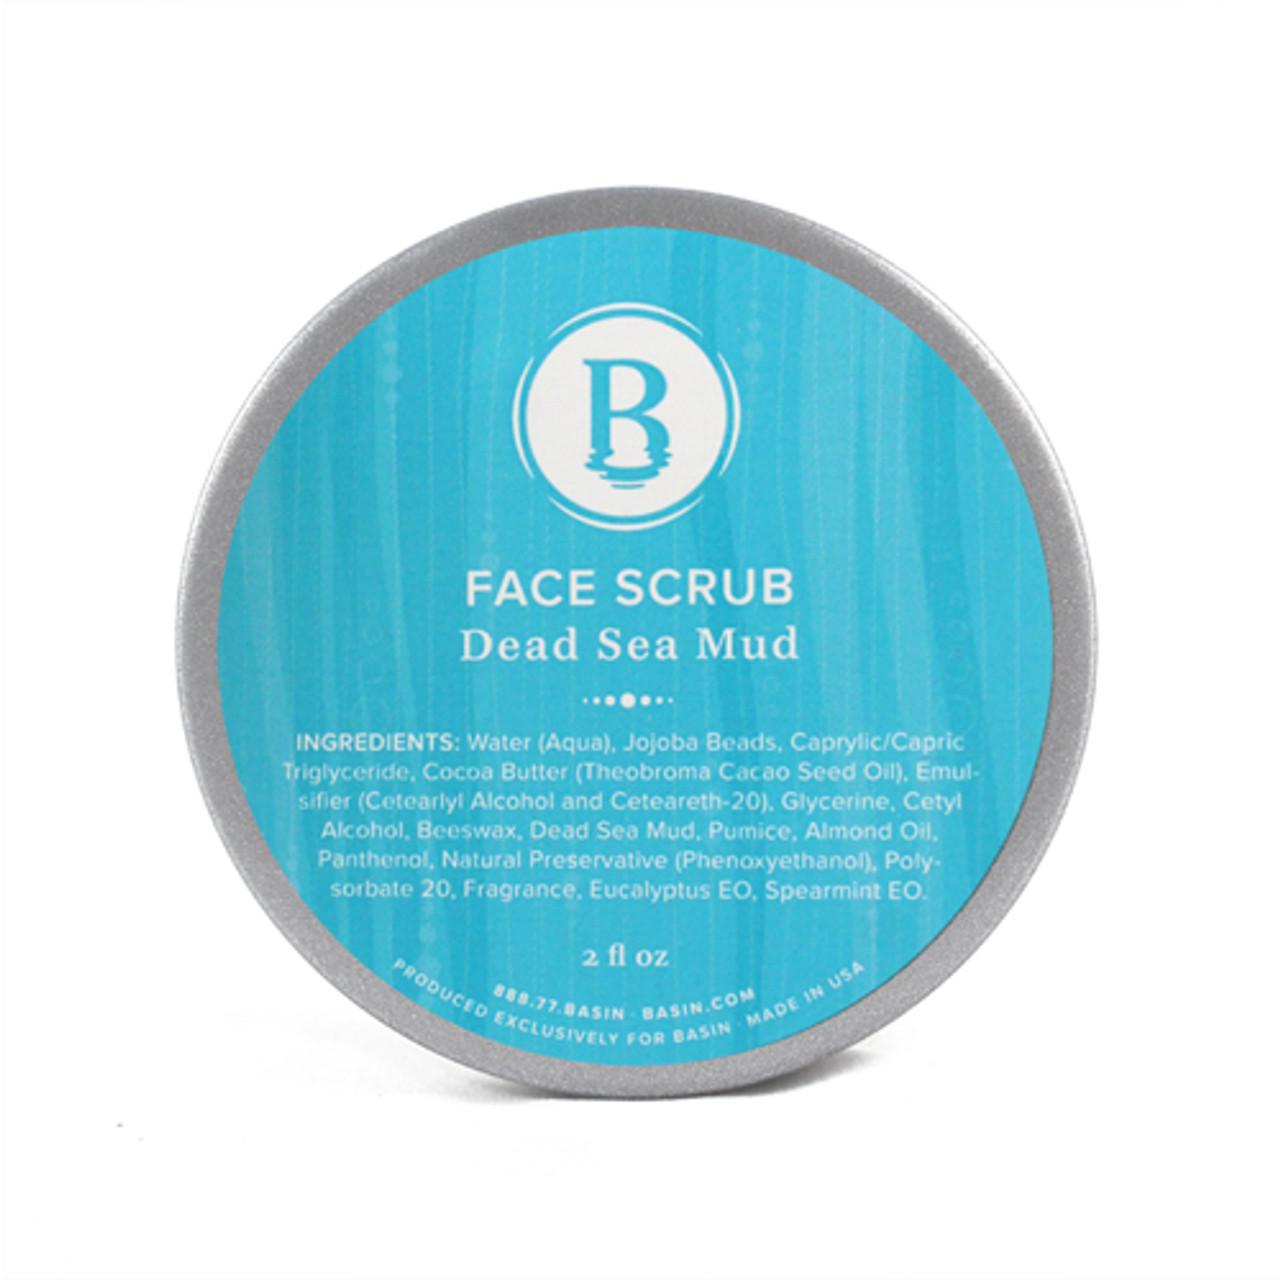 Dead Sea Mud Face Scrub